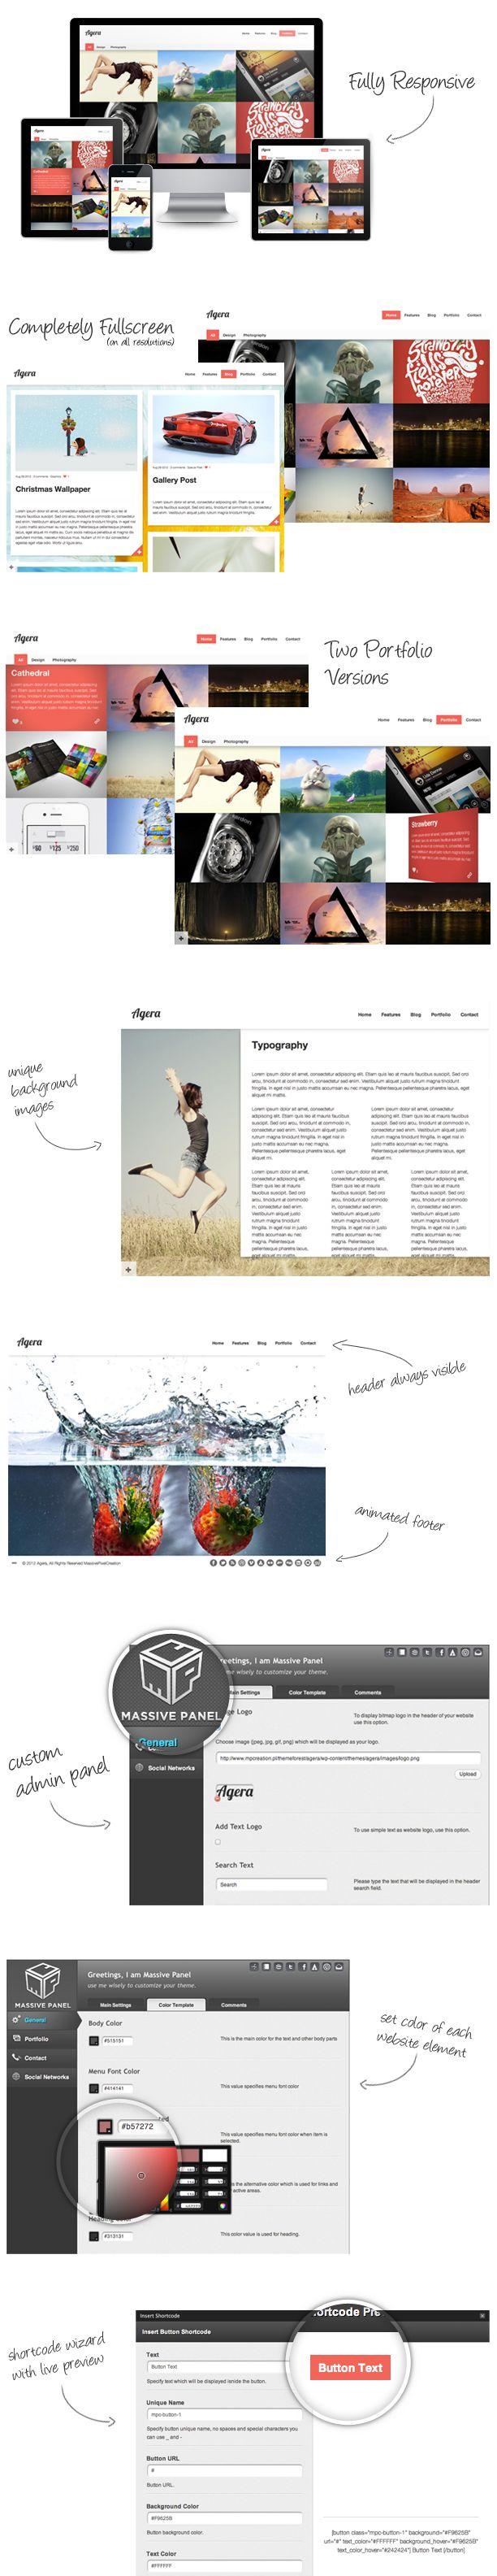 Agera WordPress Theme - Preview: Webdesign